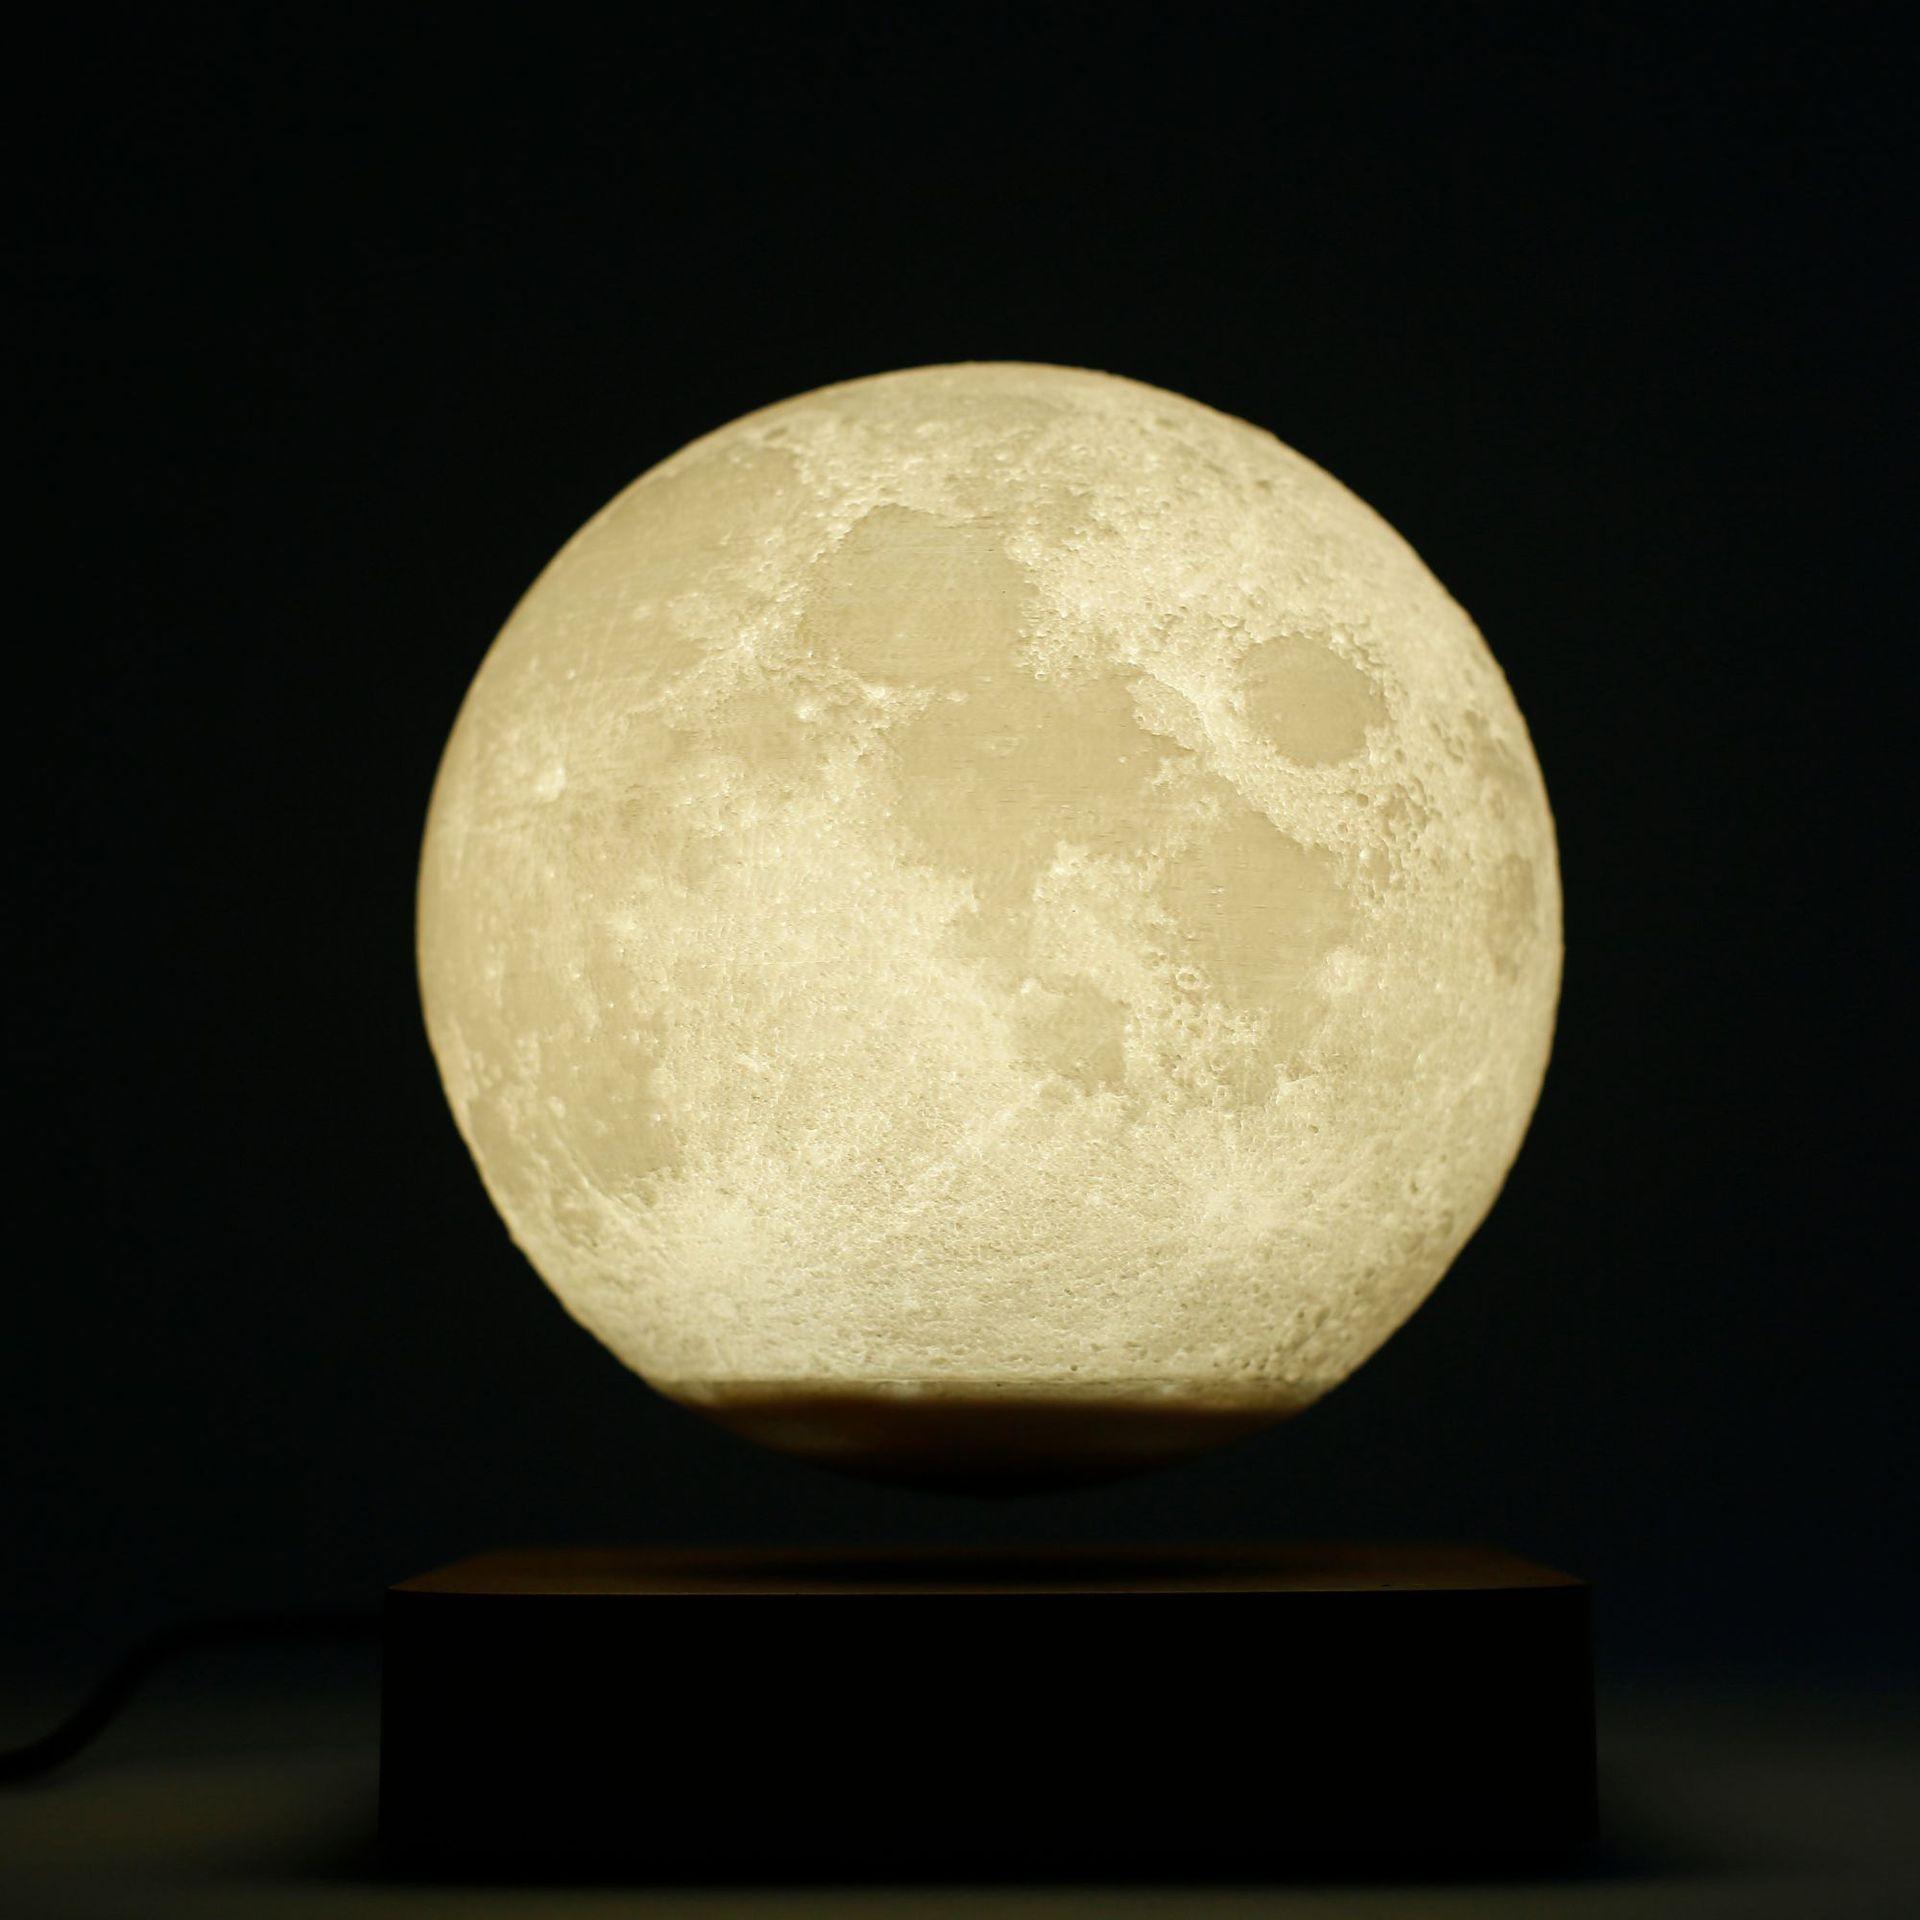 Led Light Lamp New Design Creative 3D Magnetic Levitating Moon Lamp Rotating Night Light Led For Home Decoration Holiday Gift enlarge